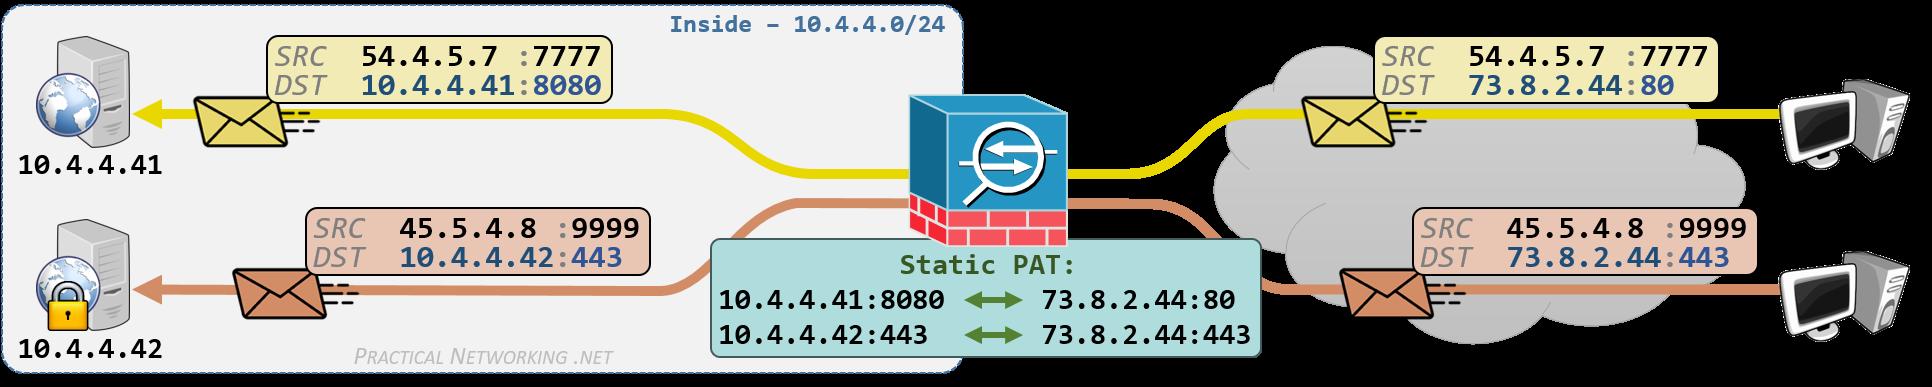 Cisco ASA NAT - Configuring Static PAT with Auto NAT and Manual NAT - Inbound